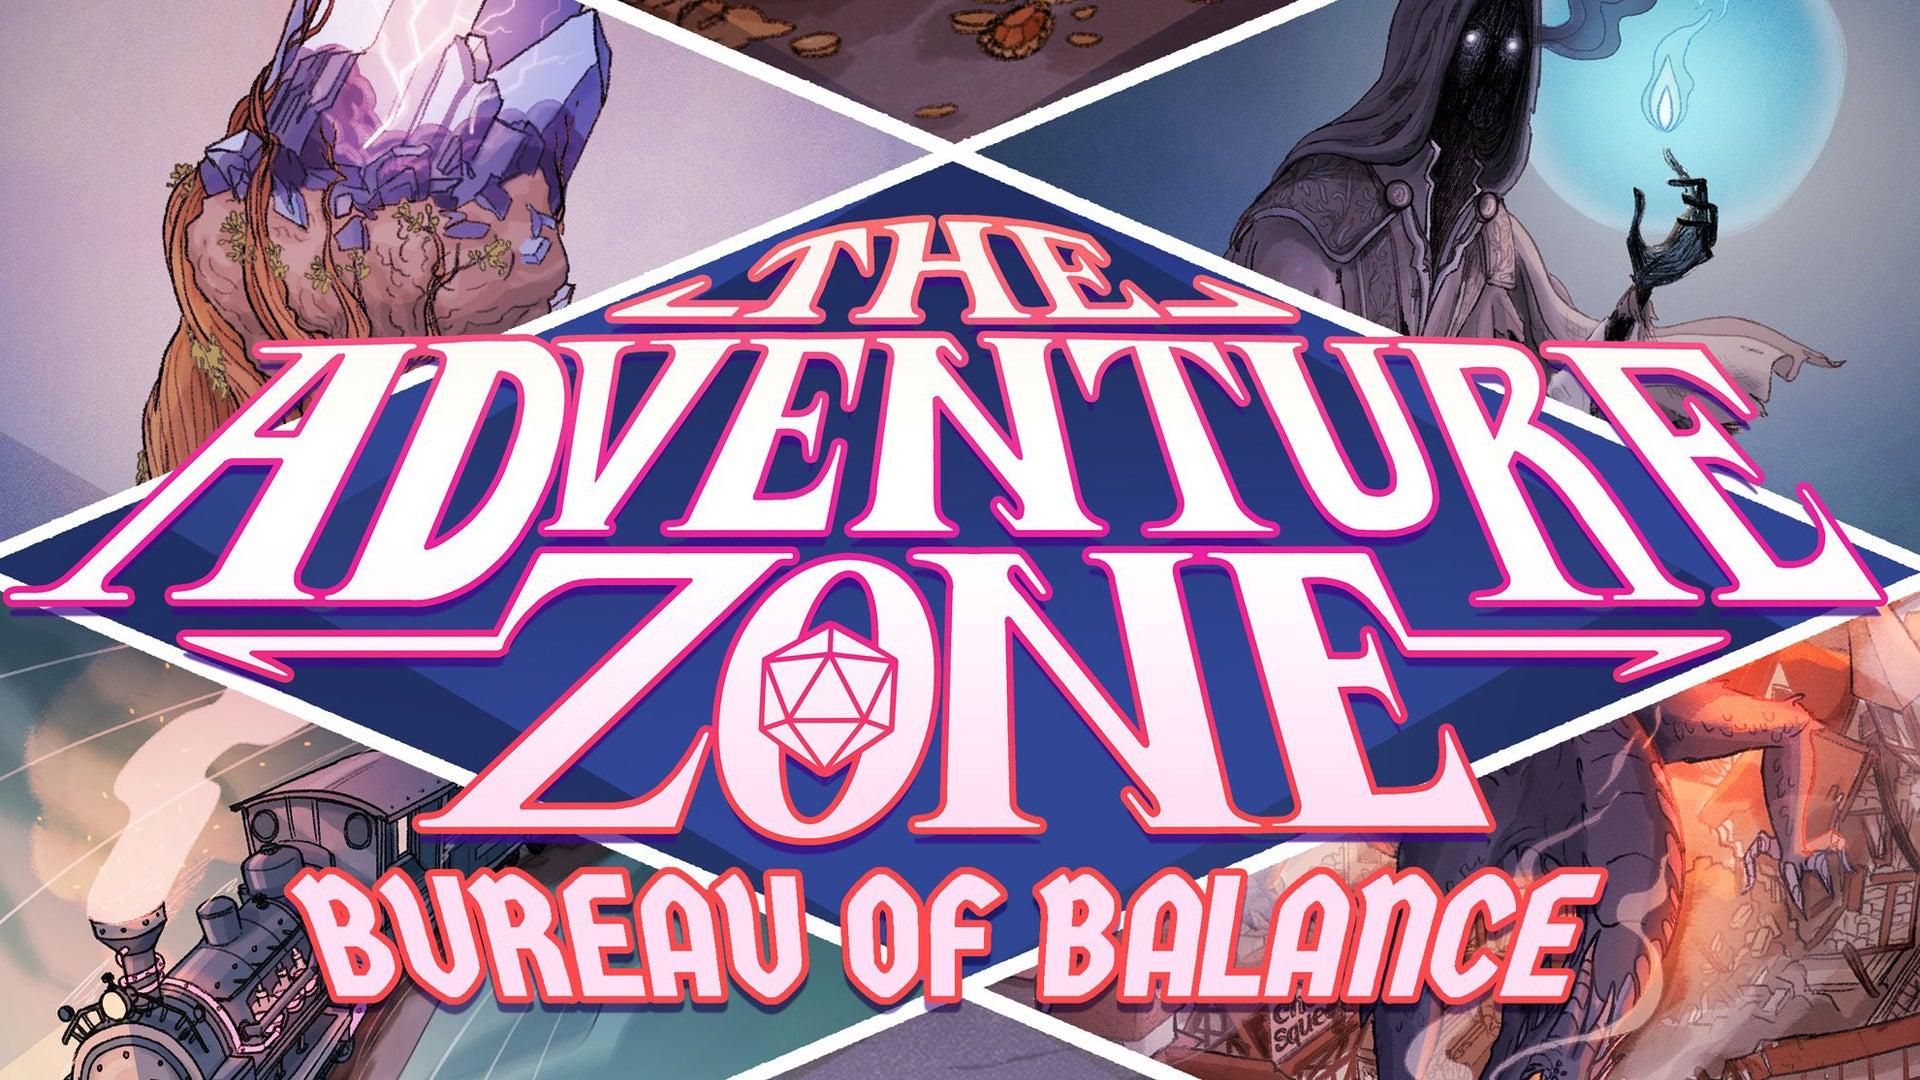 The Adventure Zone: Bureau of Balance board game artwork